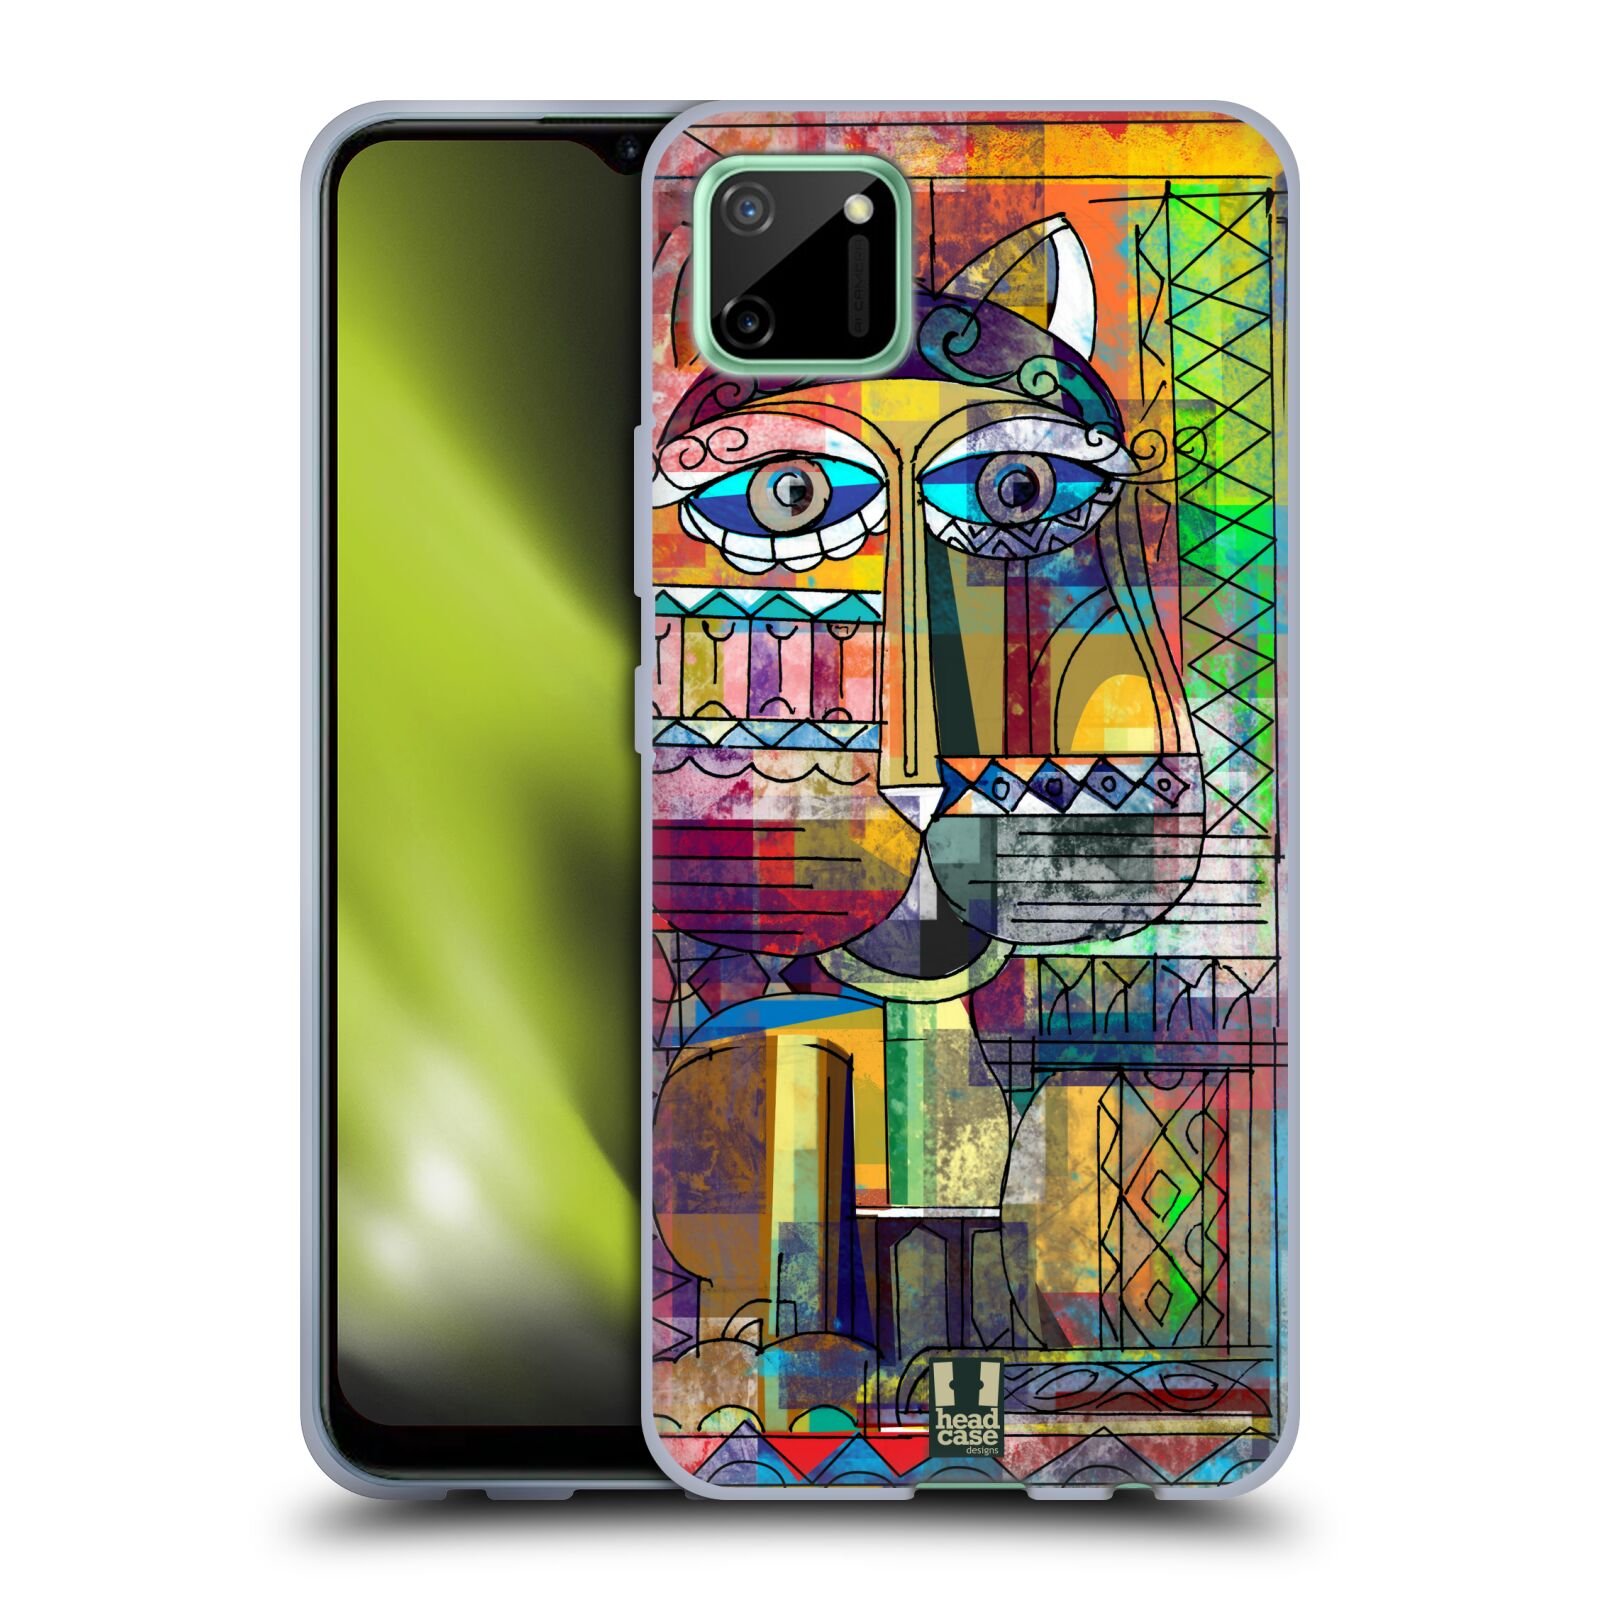 Silikonové pouzdro na mobil Realme C11 - Head Case - AZTEC KORAT